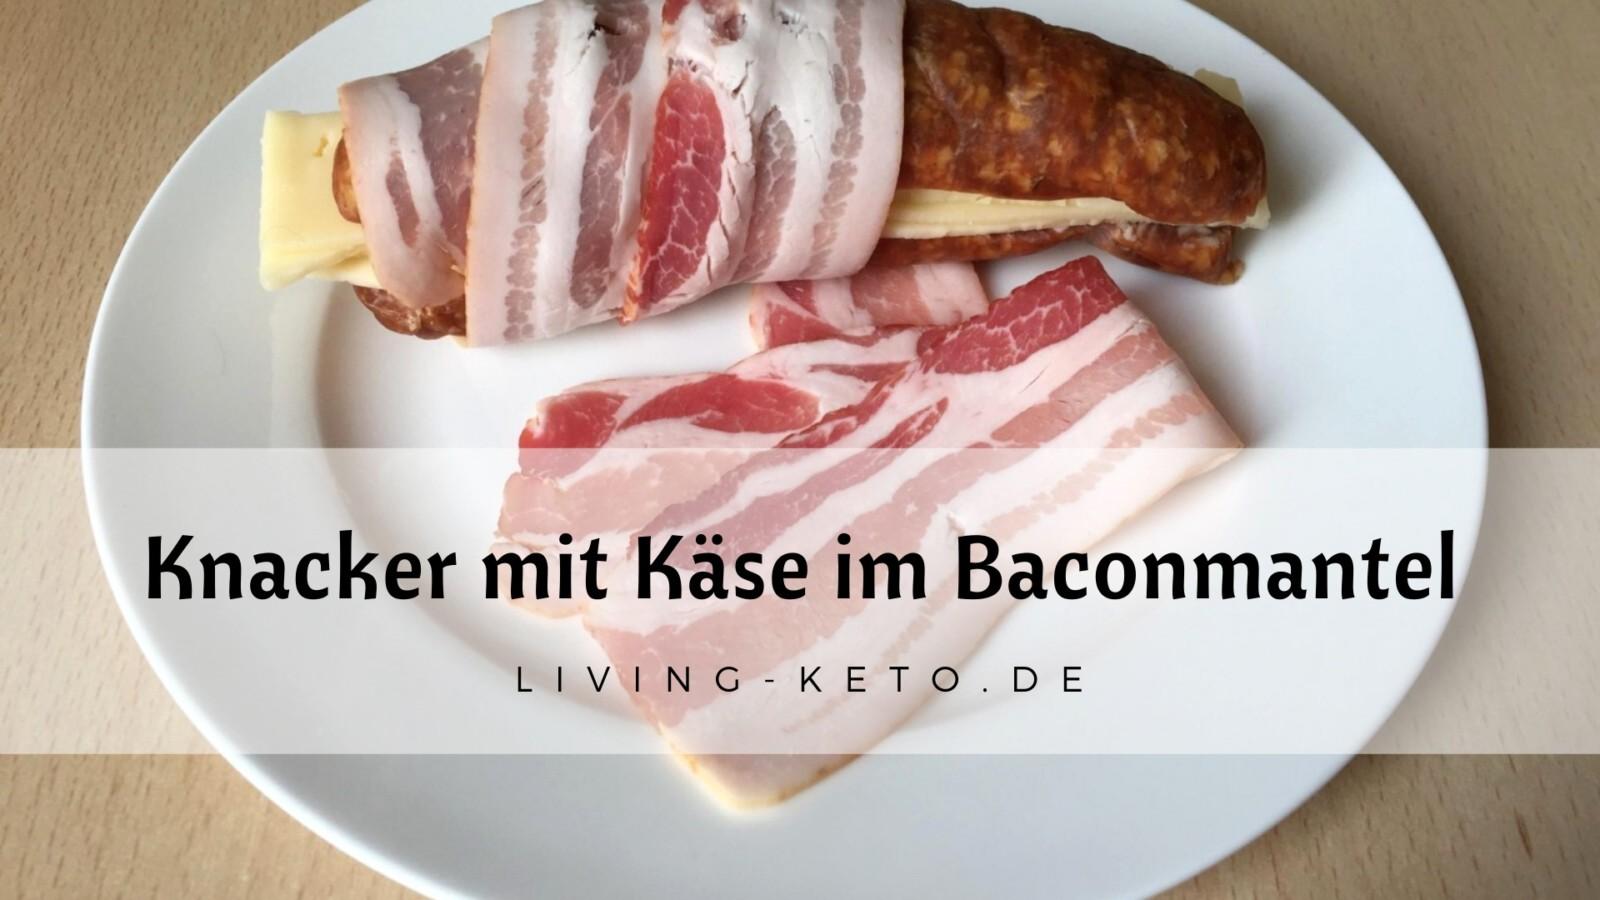 Knacker mit Käse im Bacon-Mantel